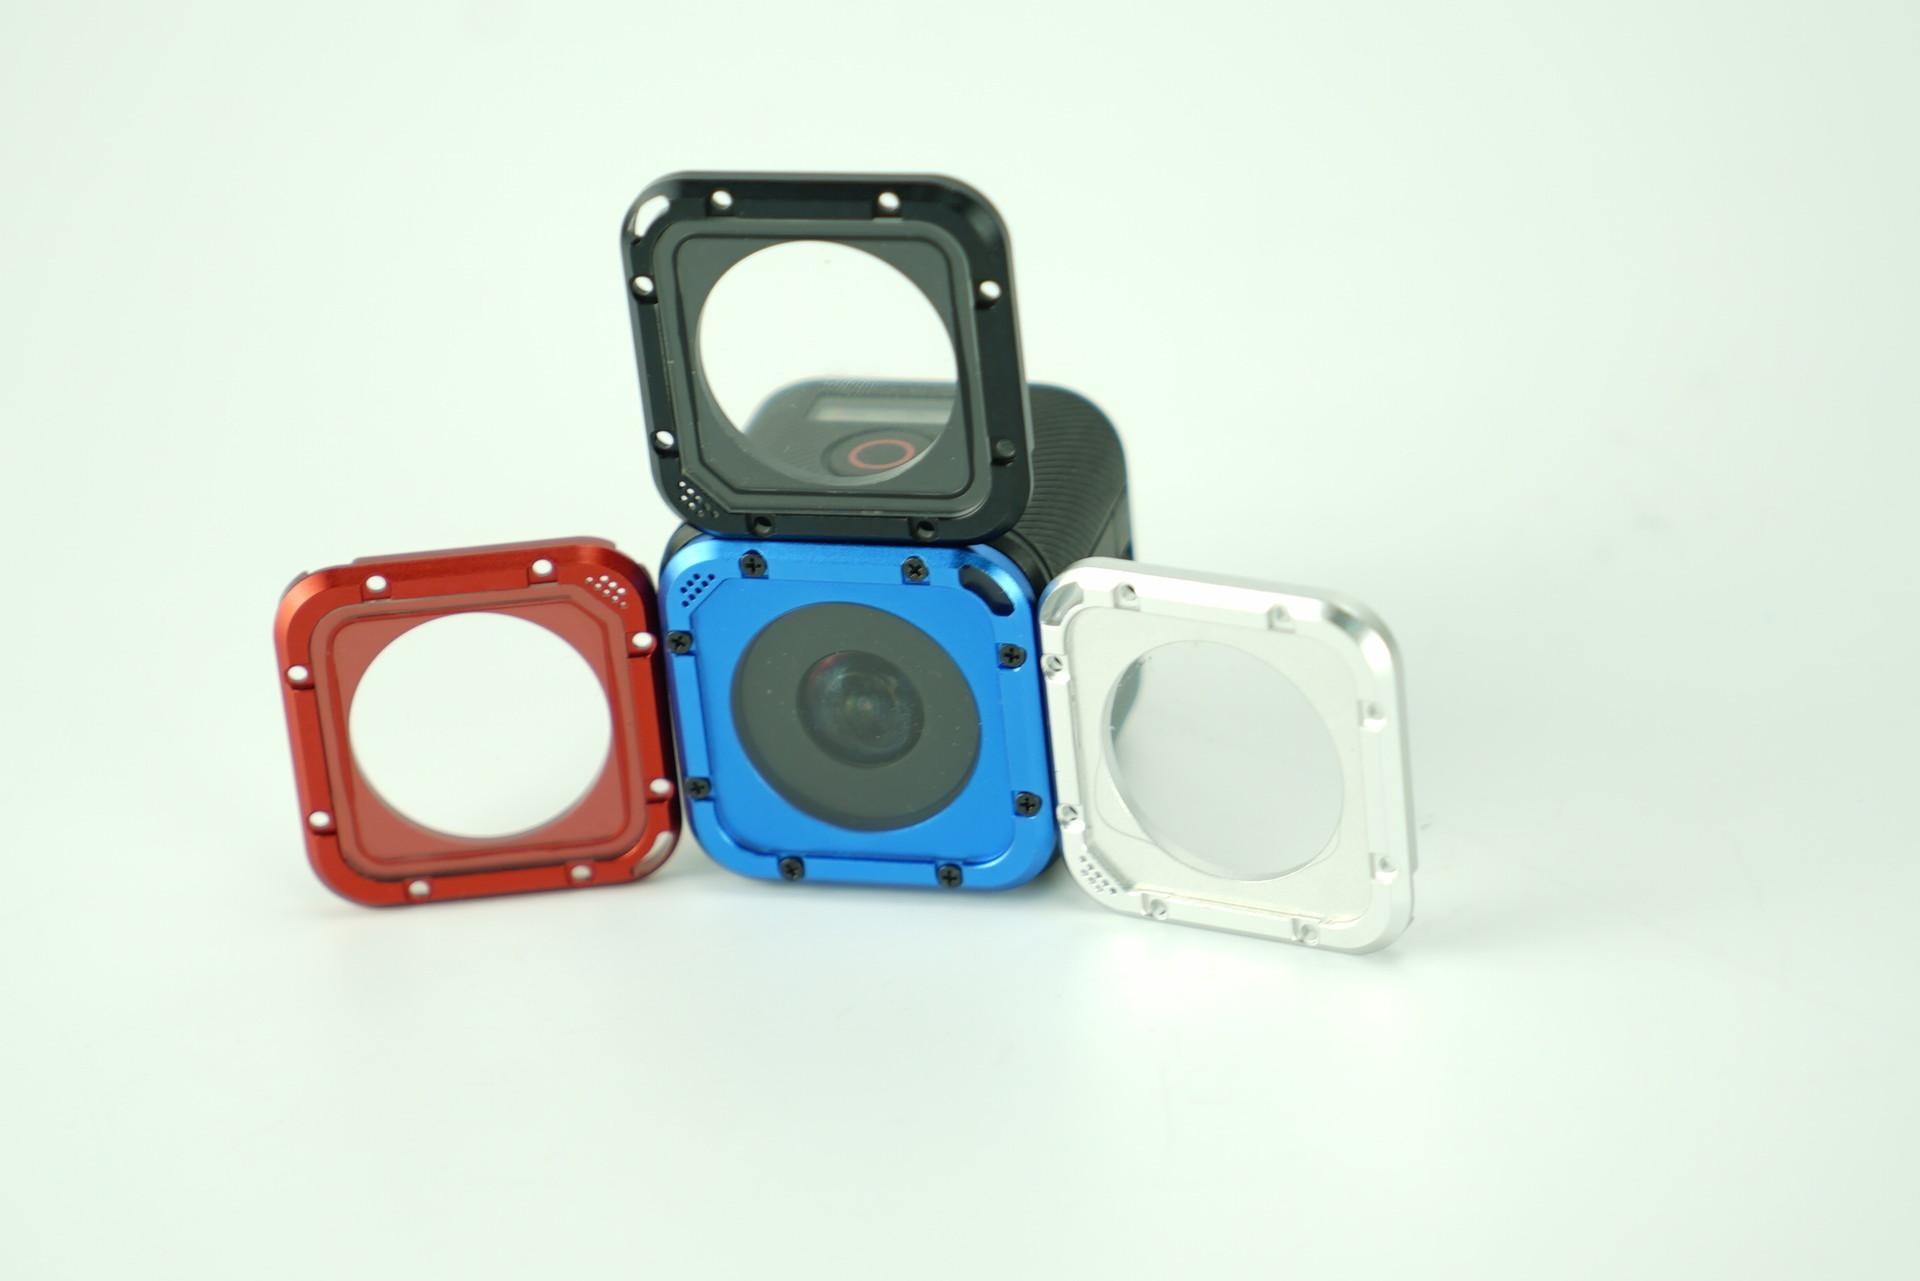 1 Piece Lens Cap Cover Case Aluminum Spare Parts For Gopro Hero 4 Session Camera Accessories Color Black Blue 16028TW/9 <br><br>Aliexpress